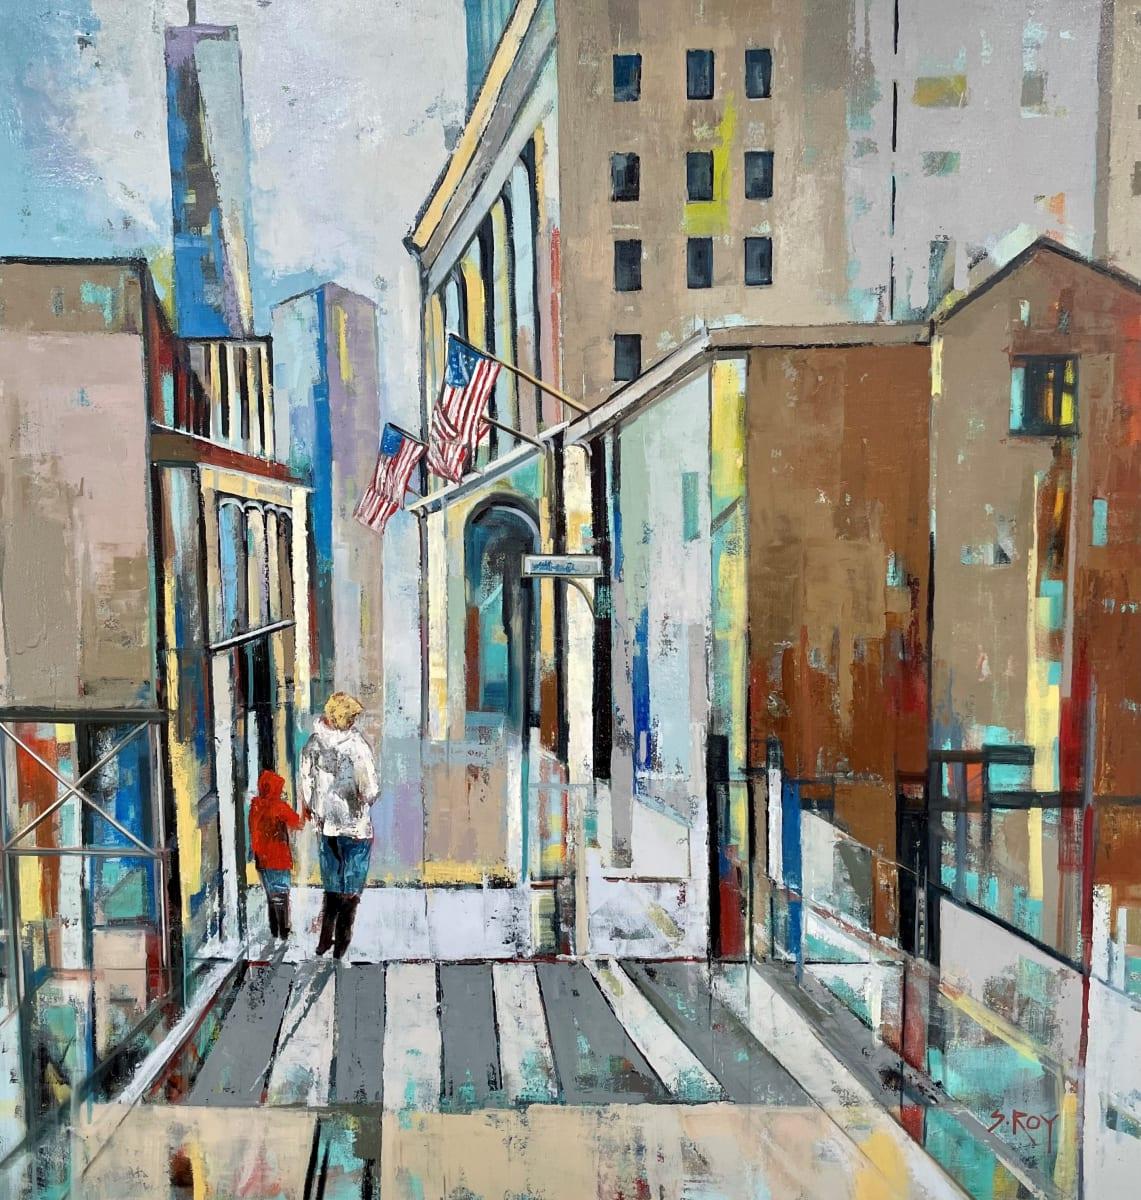 A walk in the city by Sharmila Roy